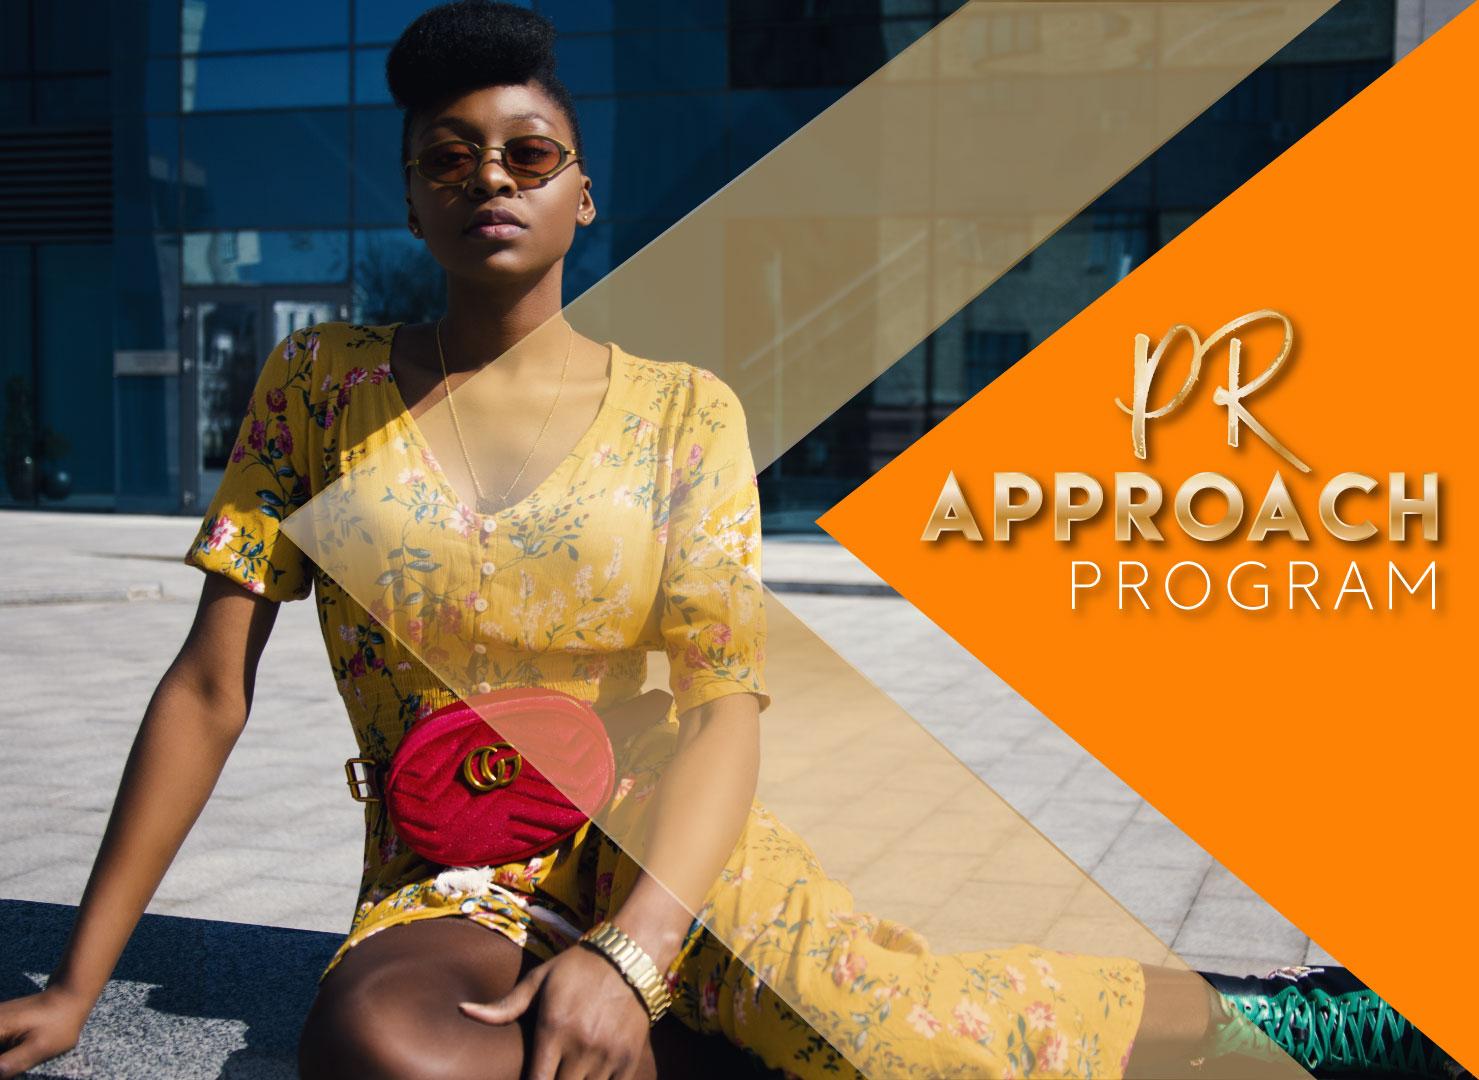 PR-Approach-Program.jpg